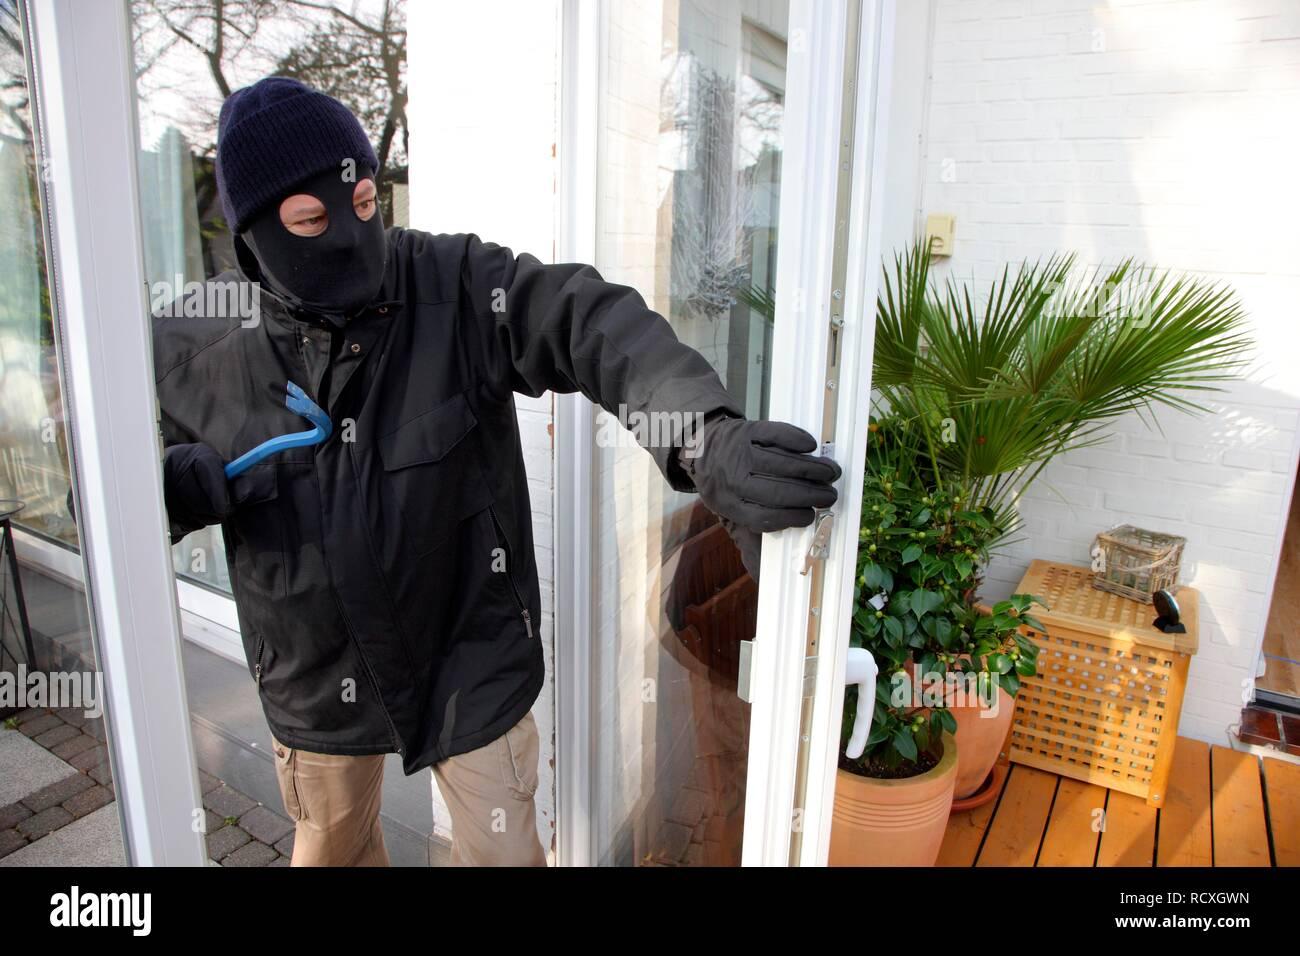 Burglar breaks open the door of the conservatory, symbolic image for domestic burglary - Stock Image